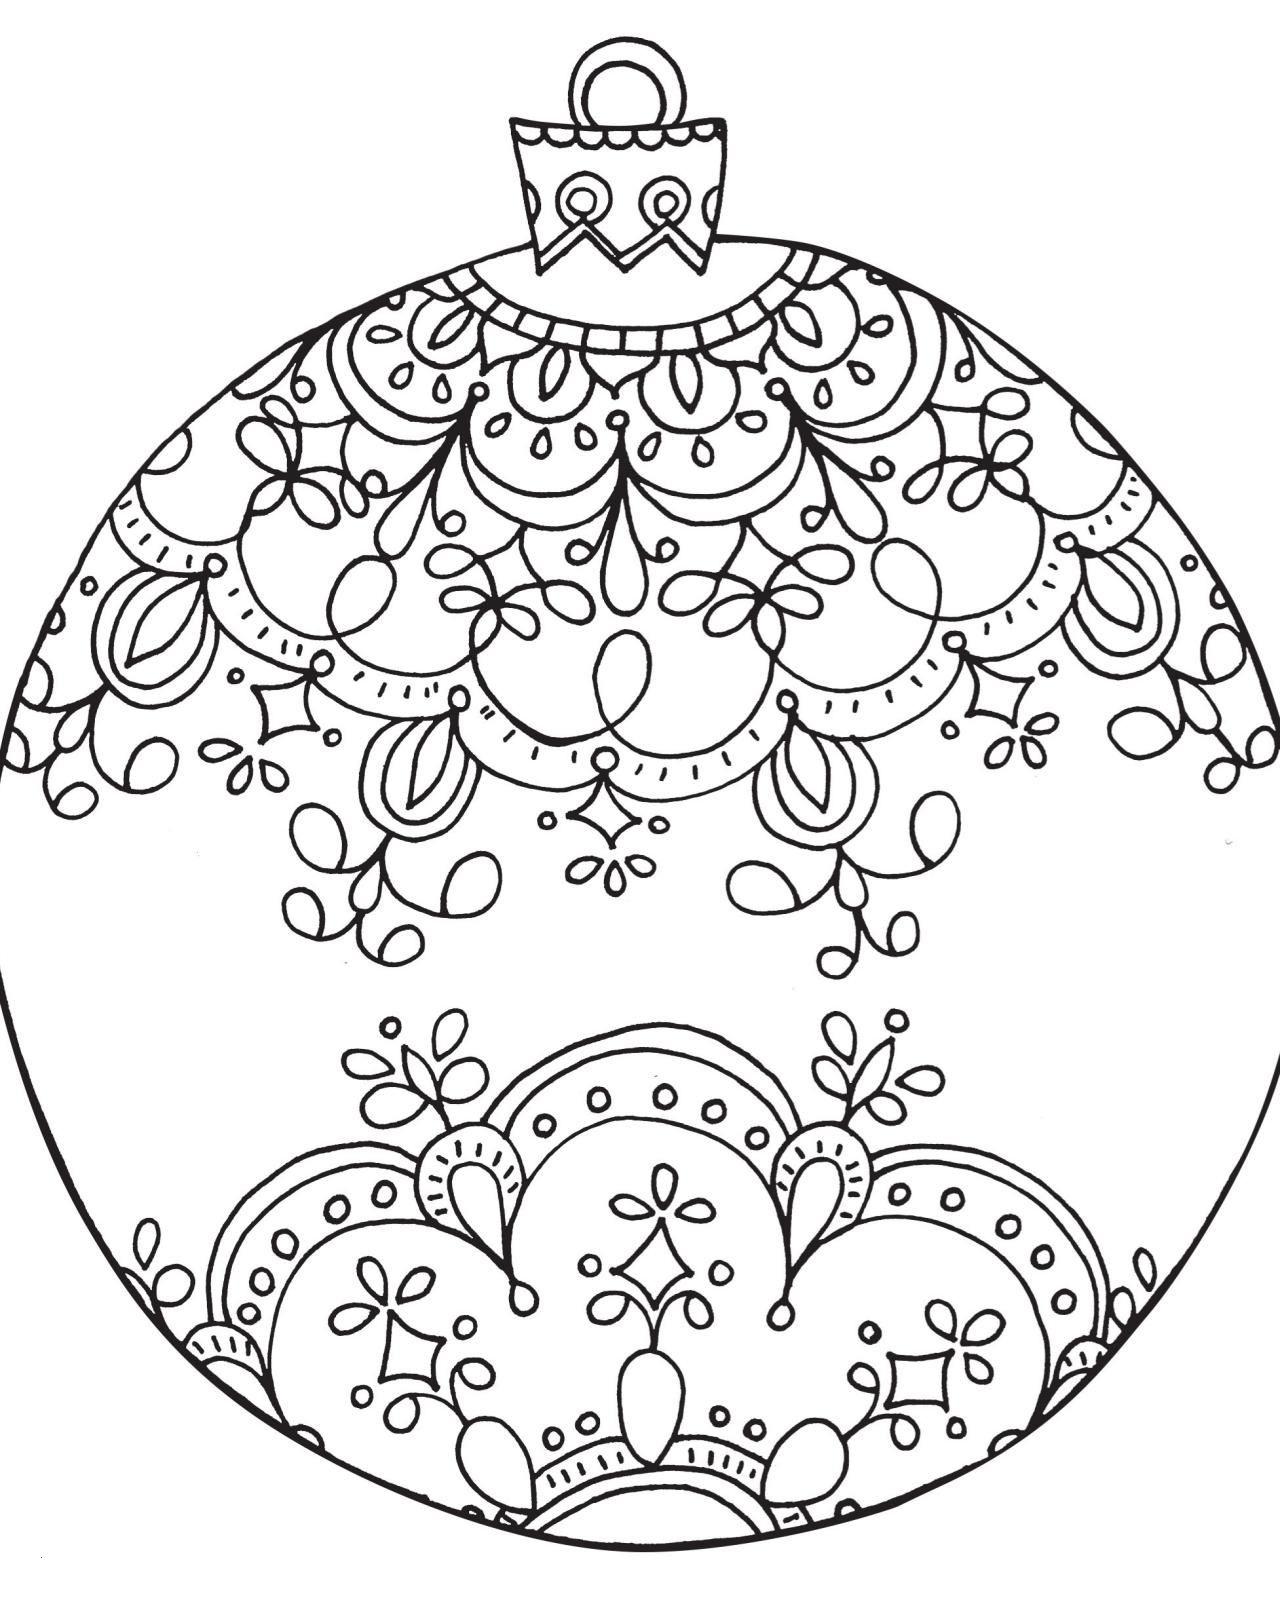 Mandala Coloring Pdf New Free Printable Coloring Pages For Adults - Free Printable Mandalas Pdf